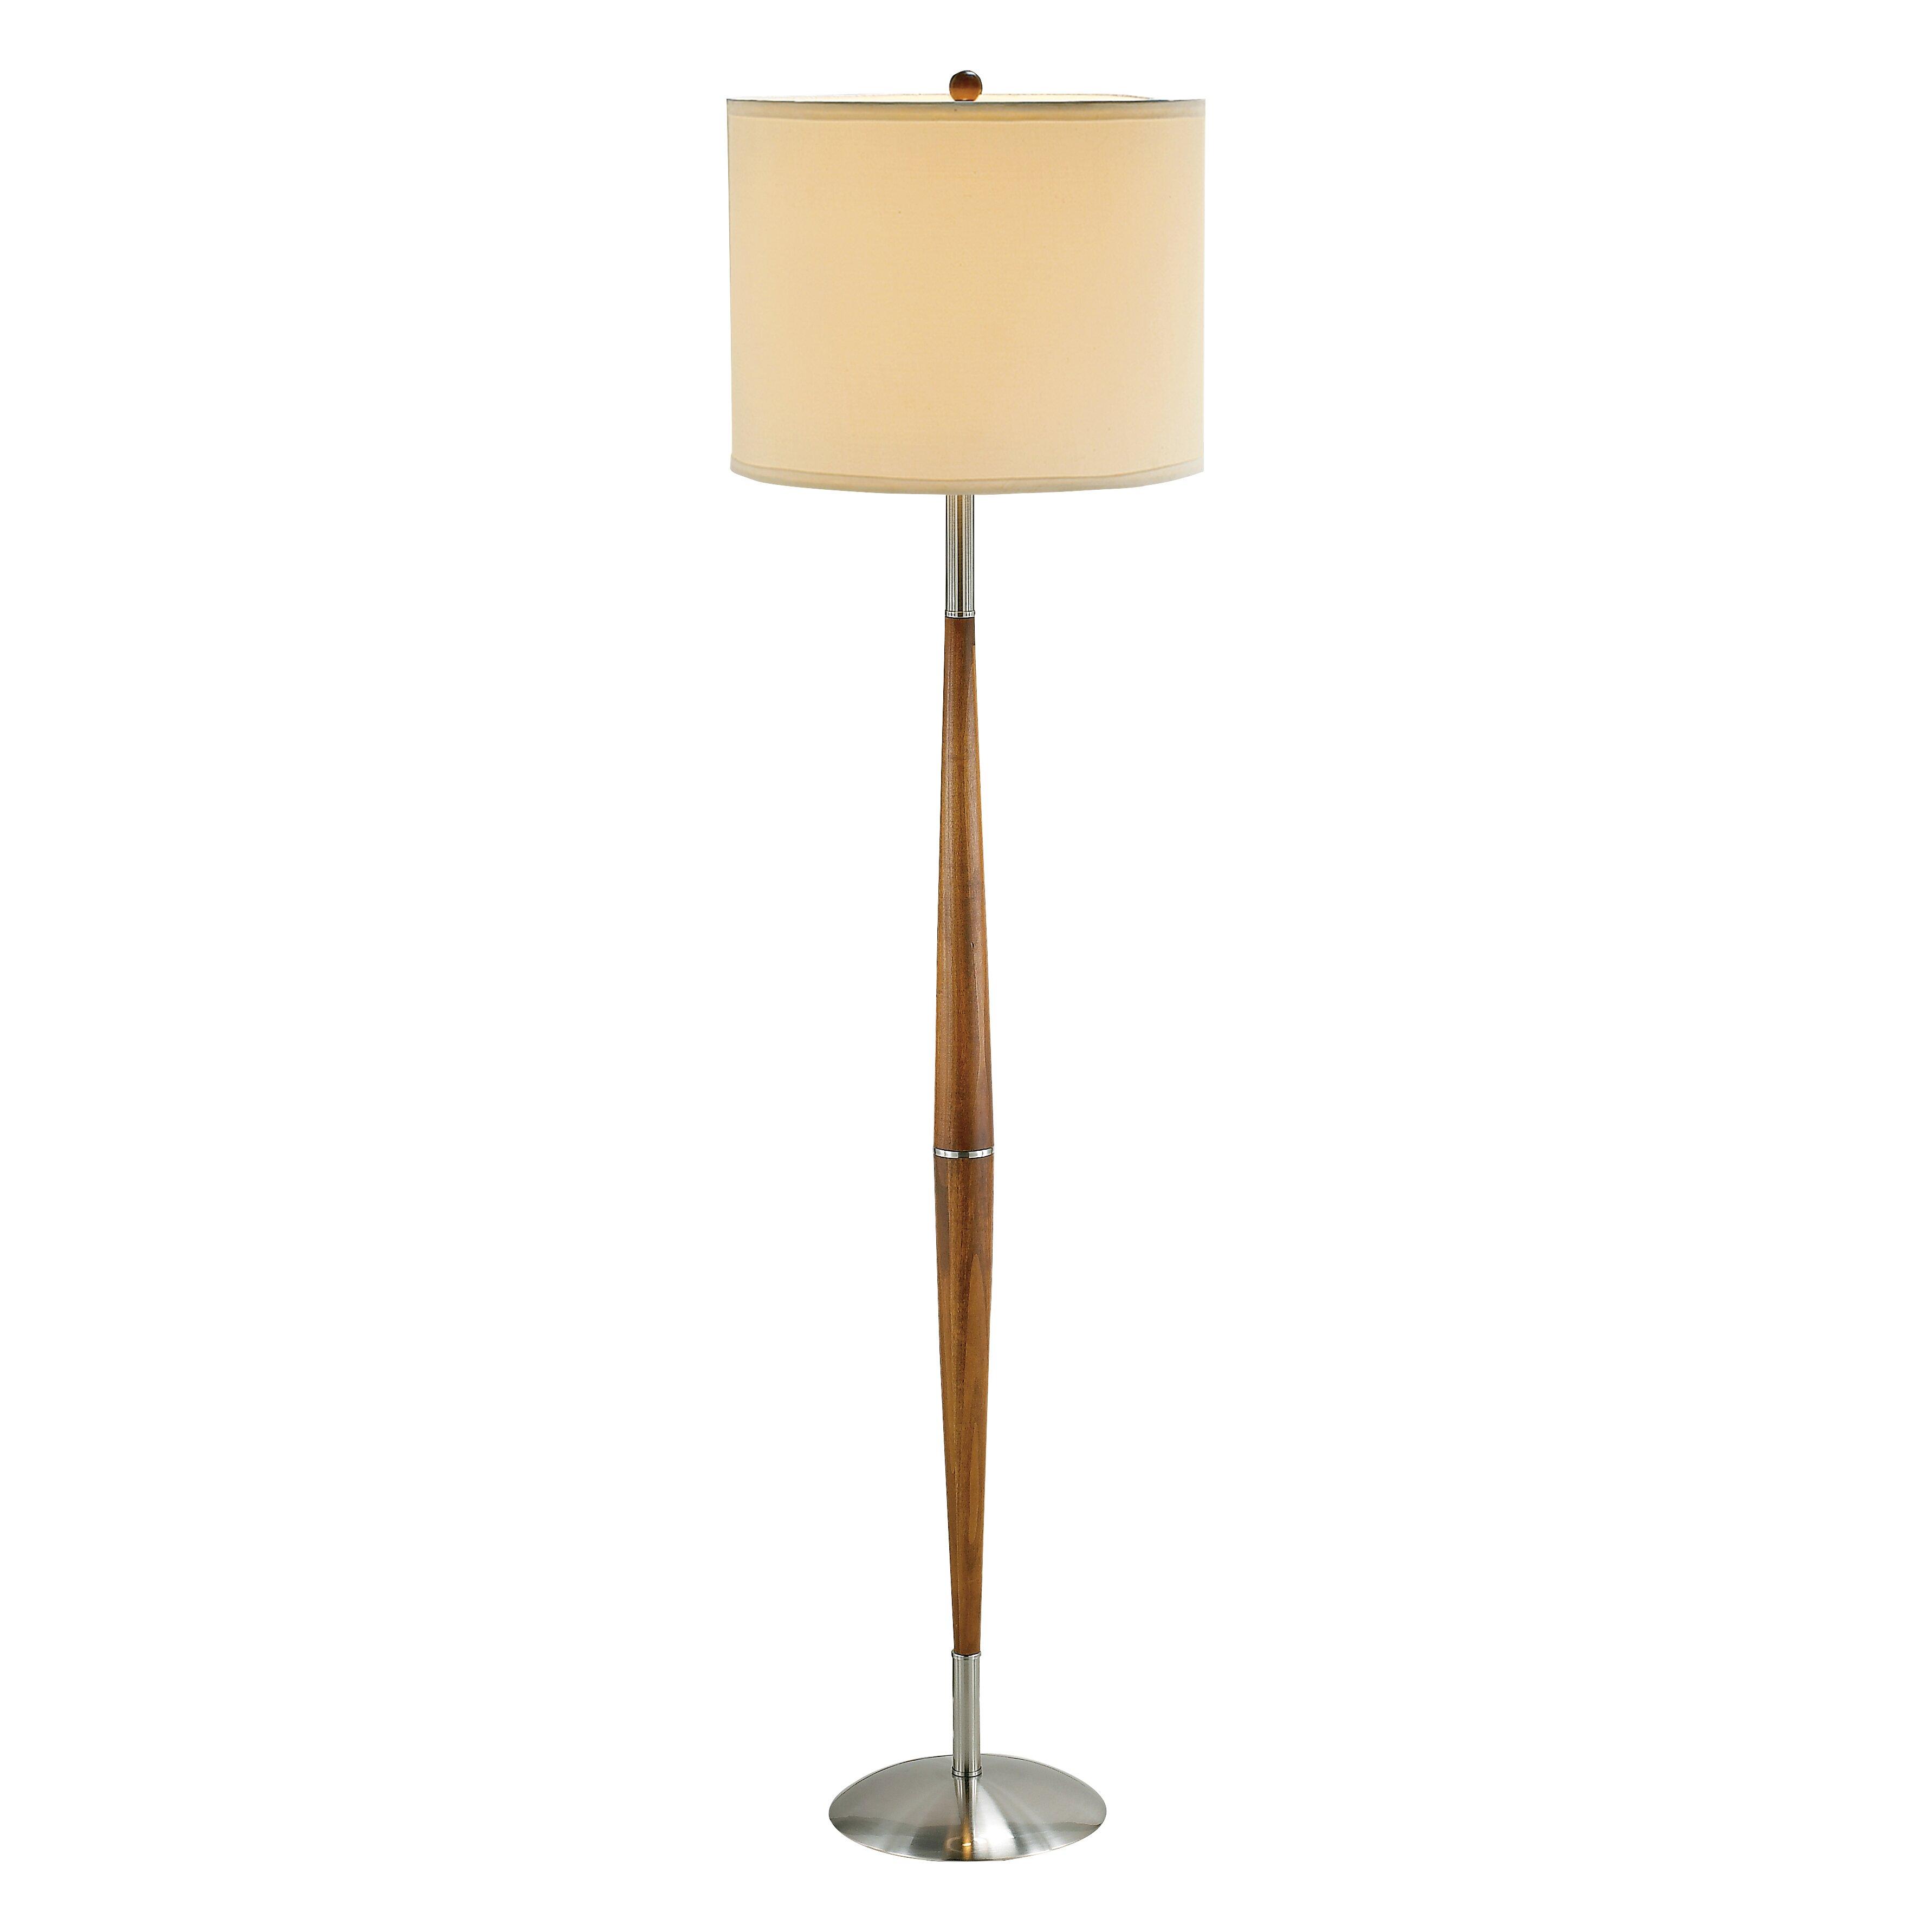 Lighting Lamps ... Mid-Century Floor Lamps Mercury Row SKU: MCRR2825